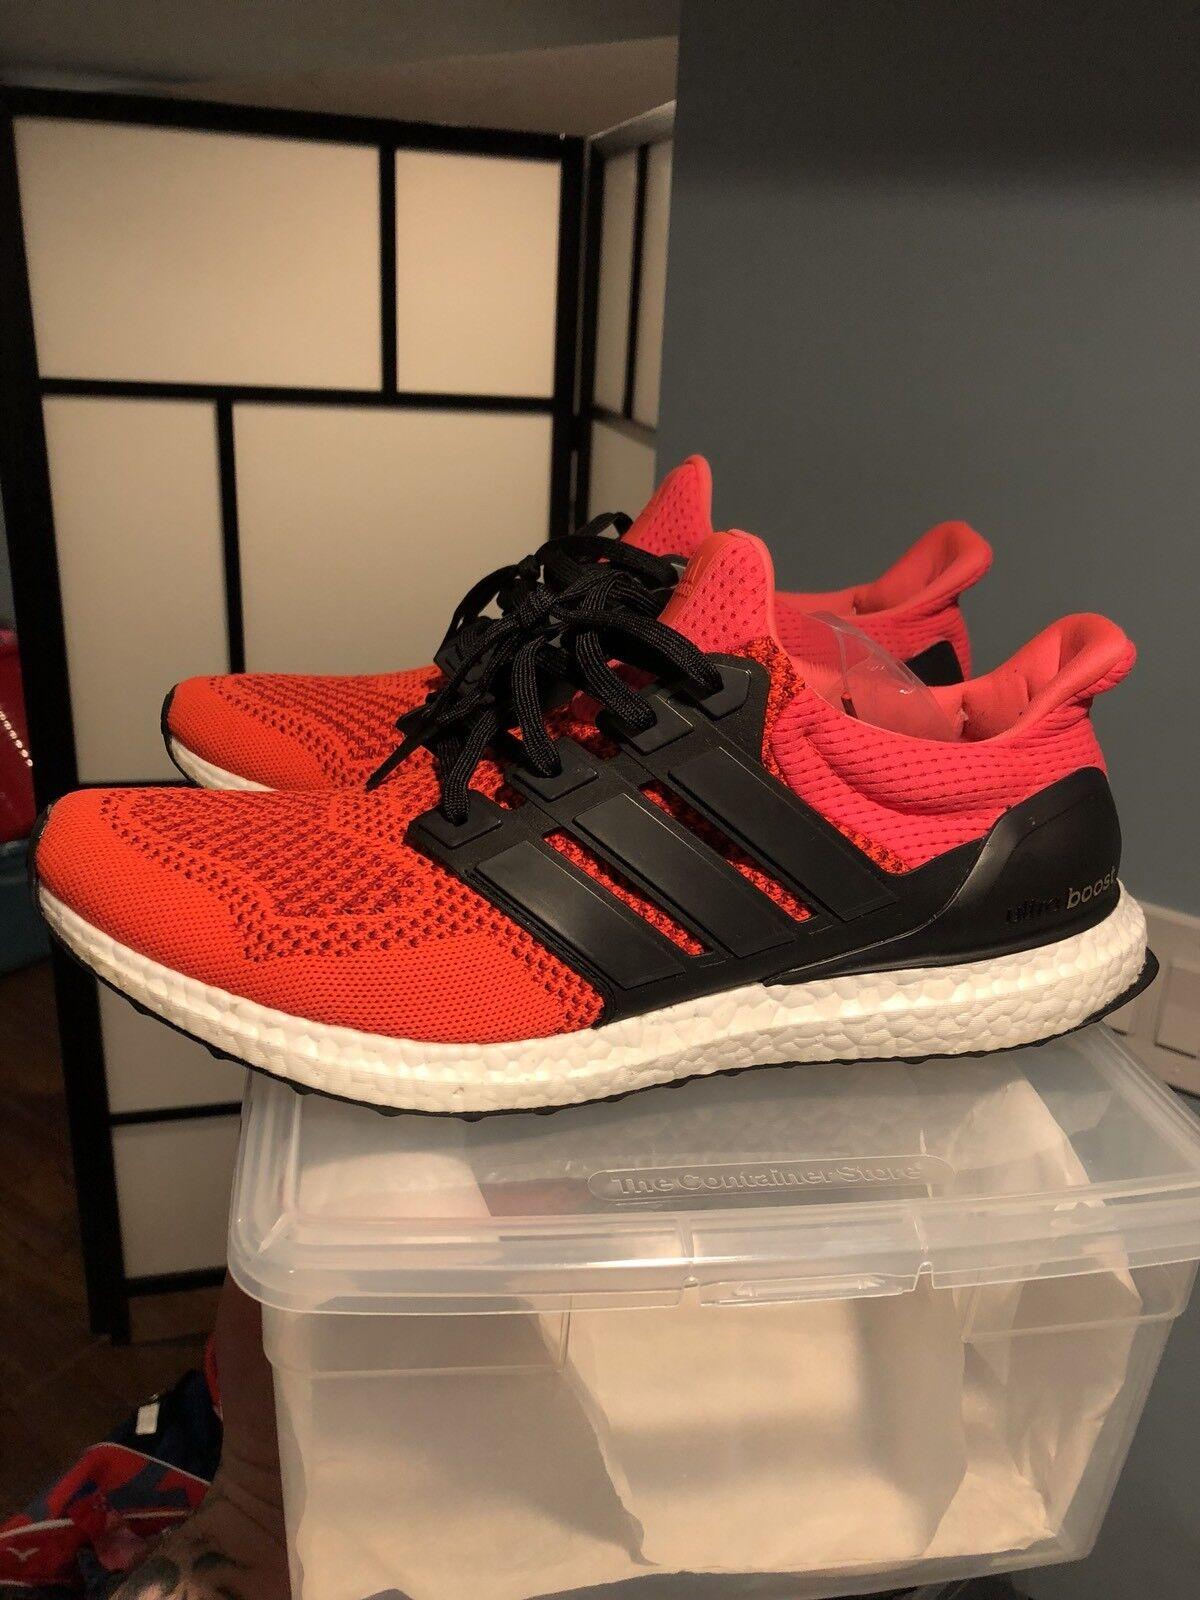 ADIDAS ULTRABOOST 1.0 SOLAR RED B34050 sz 13  yeezy nmd ultra boost orange VNDS